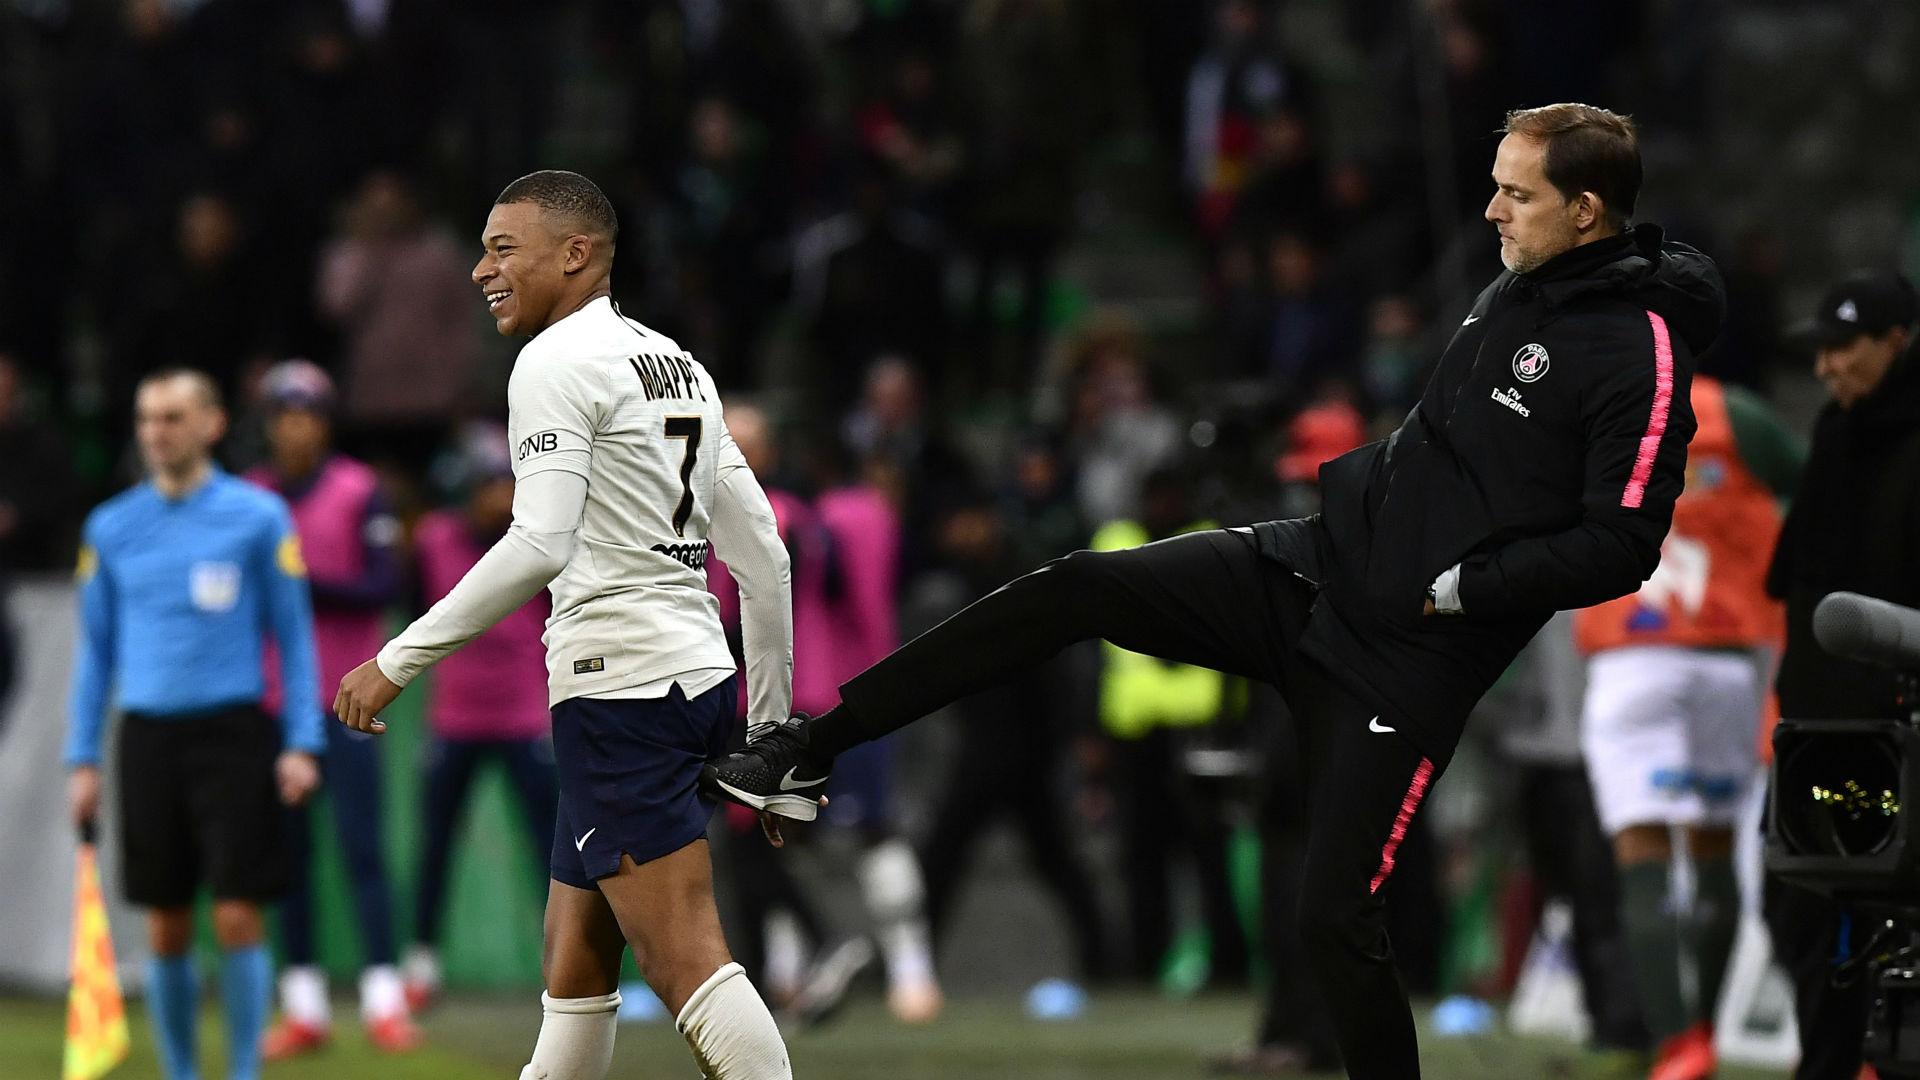 Mbappe workload a concern for PSG boss Tuchel